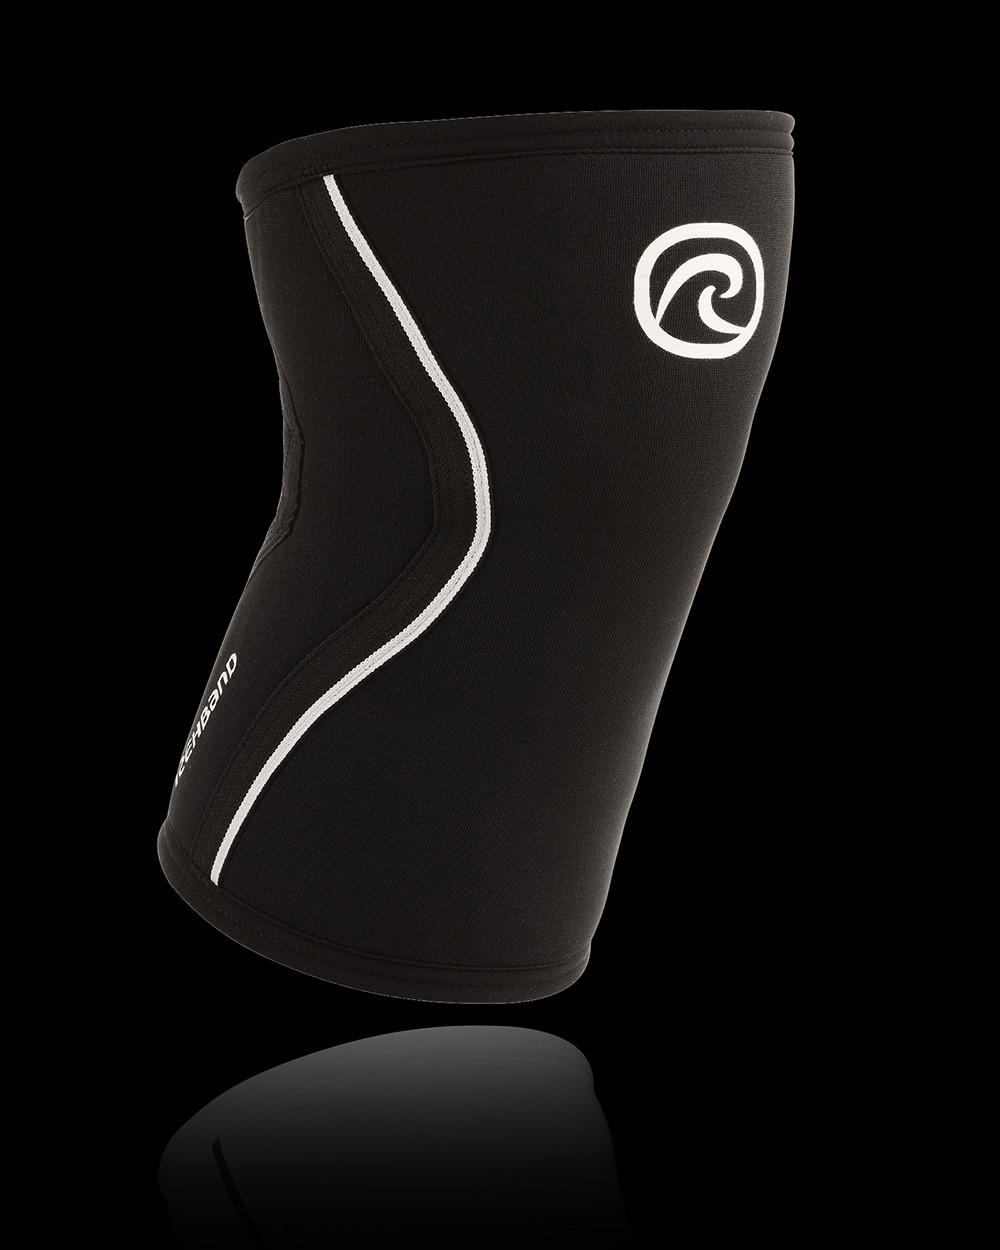 Rehband RX Kniebandage schwarz 3mm